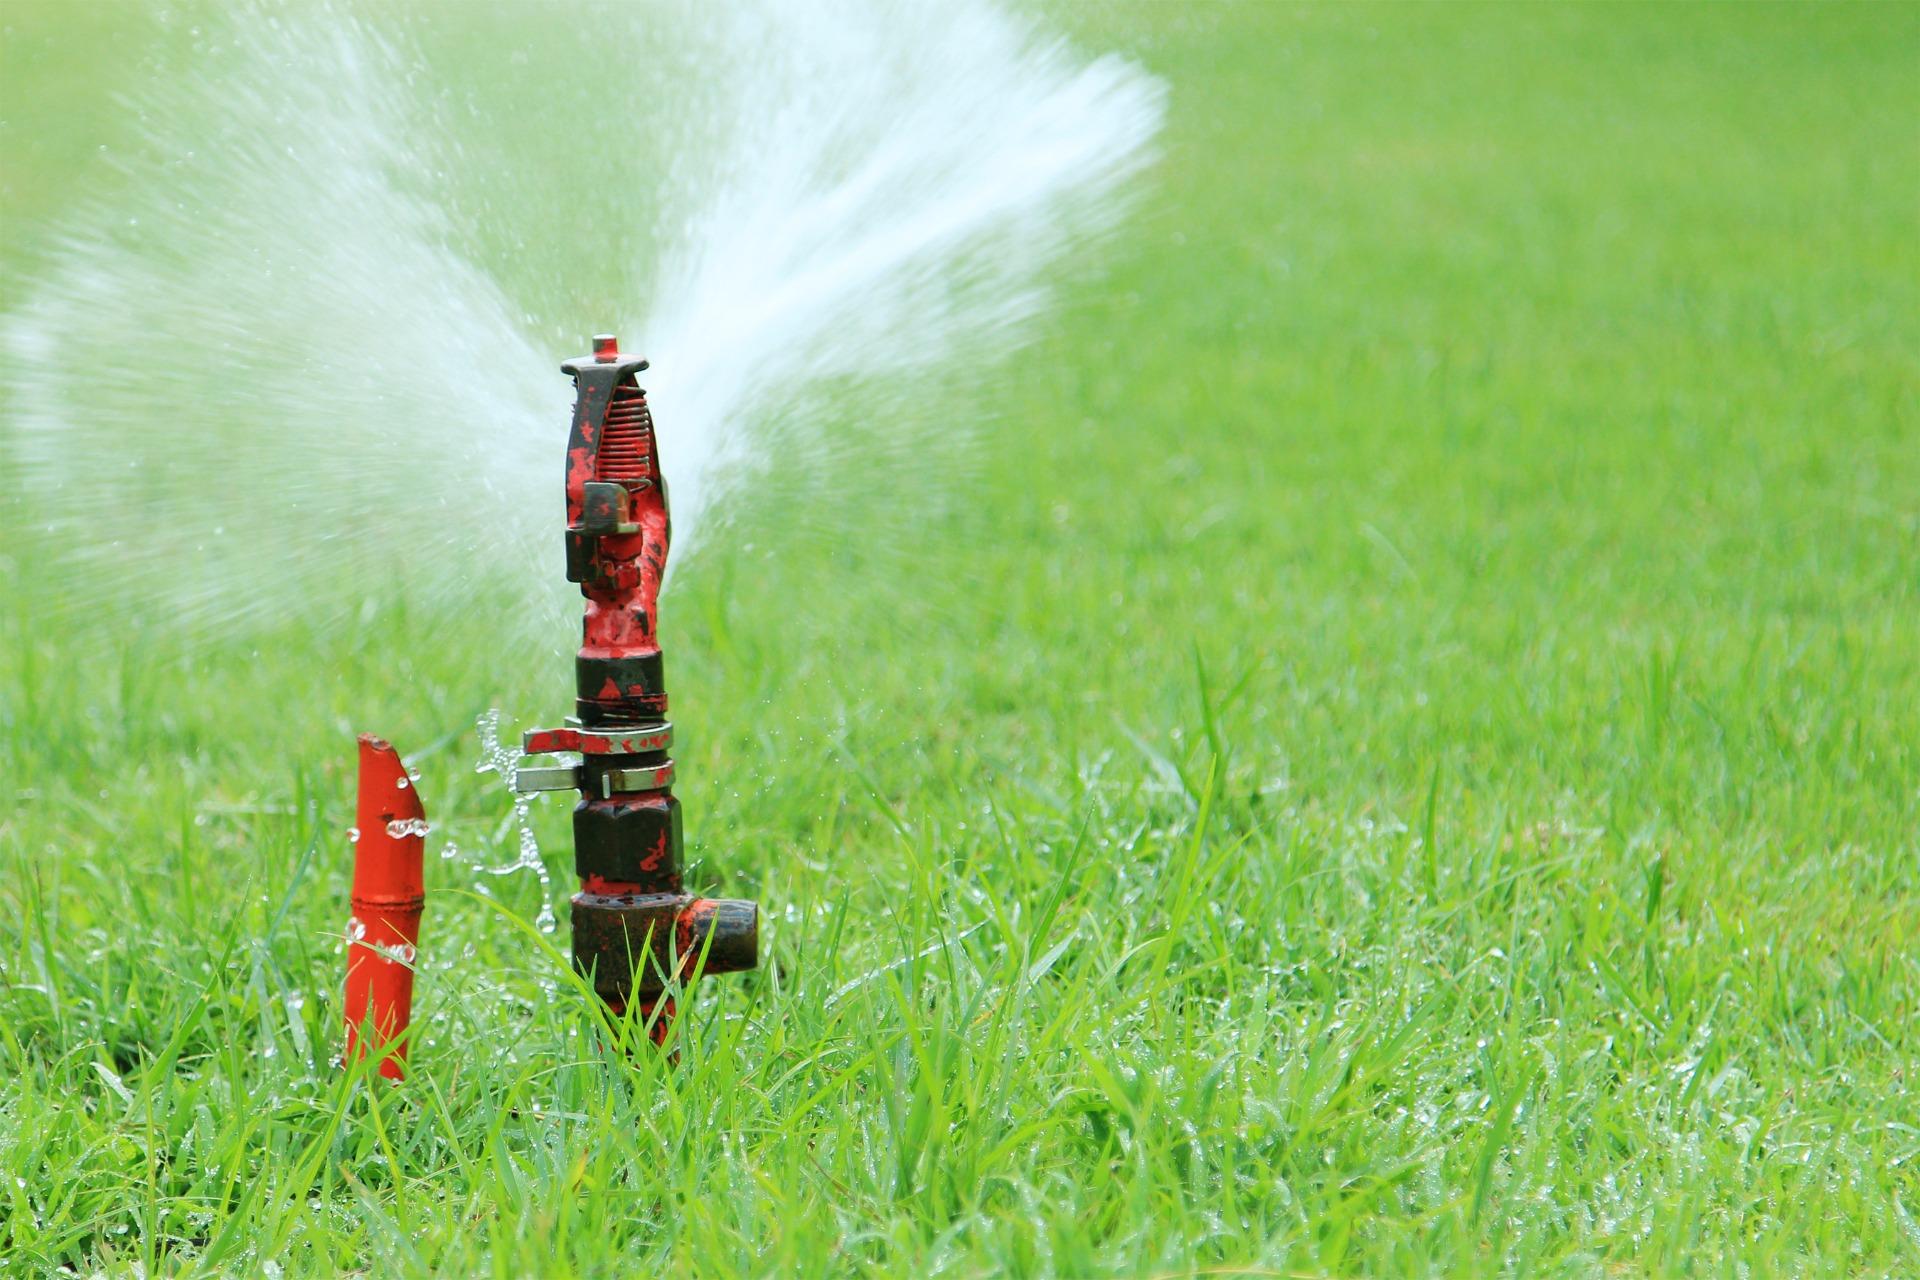 Sprinkler Systems Contractors   CJ Outdoor Lighting & Sprinkler Systems